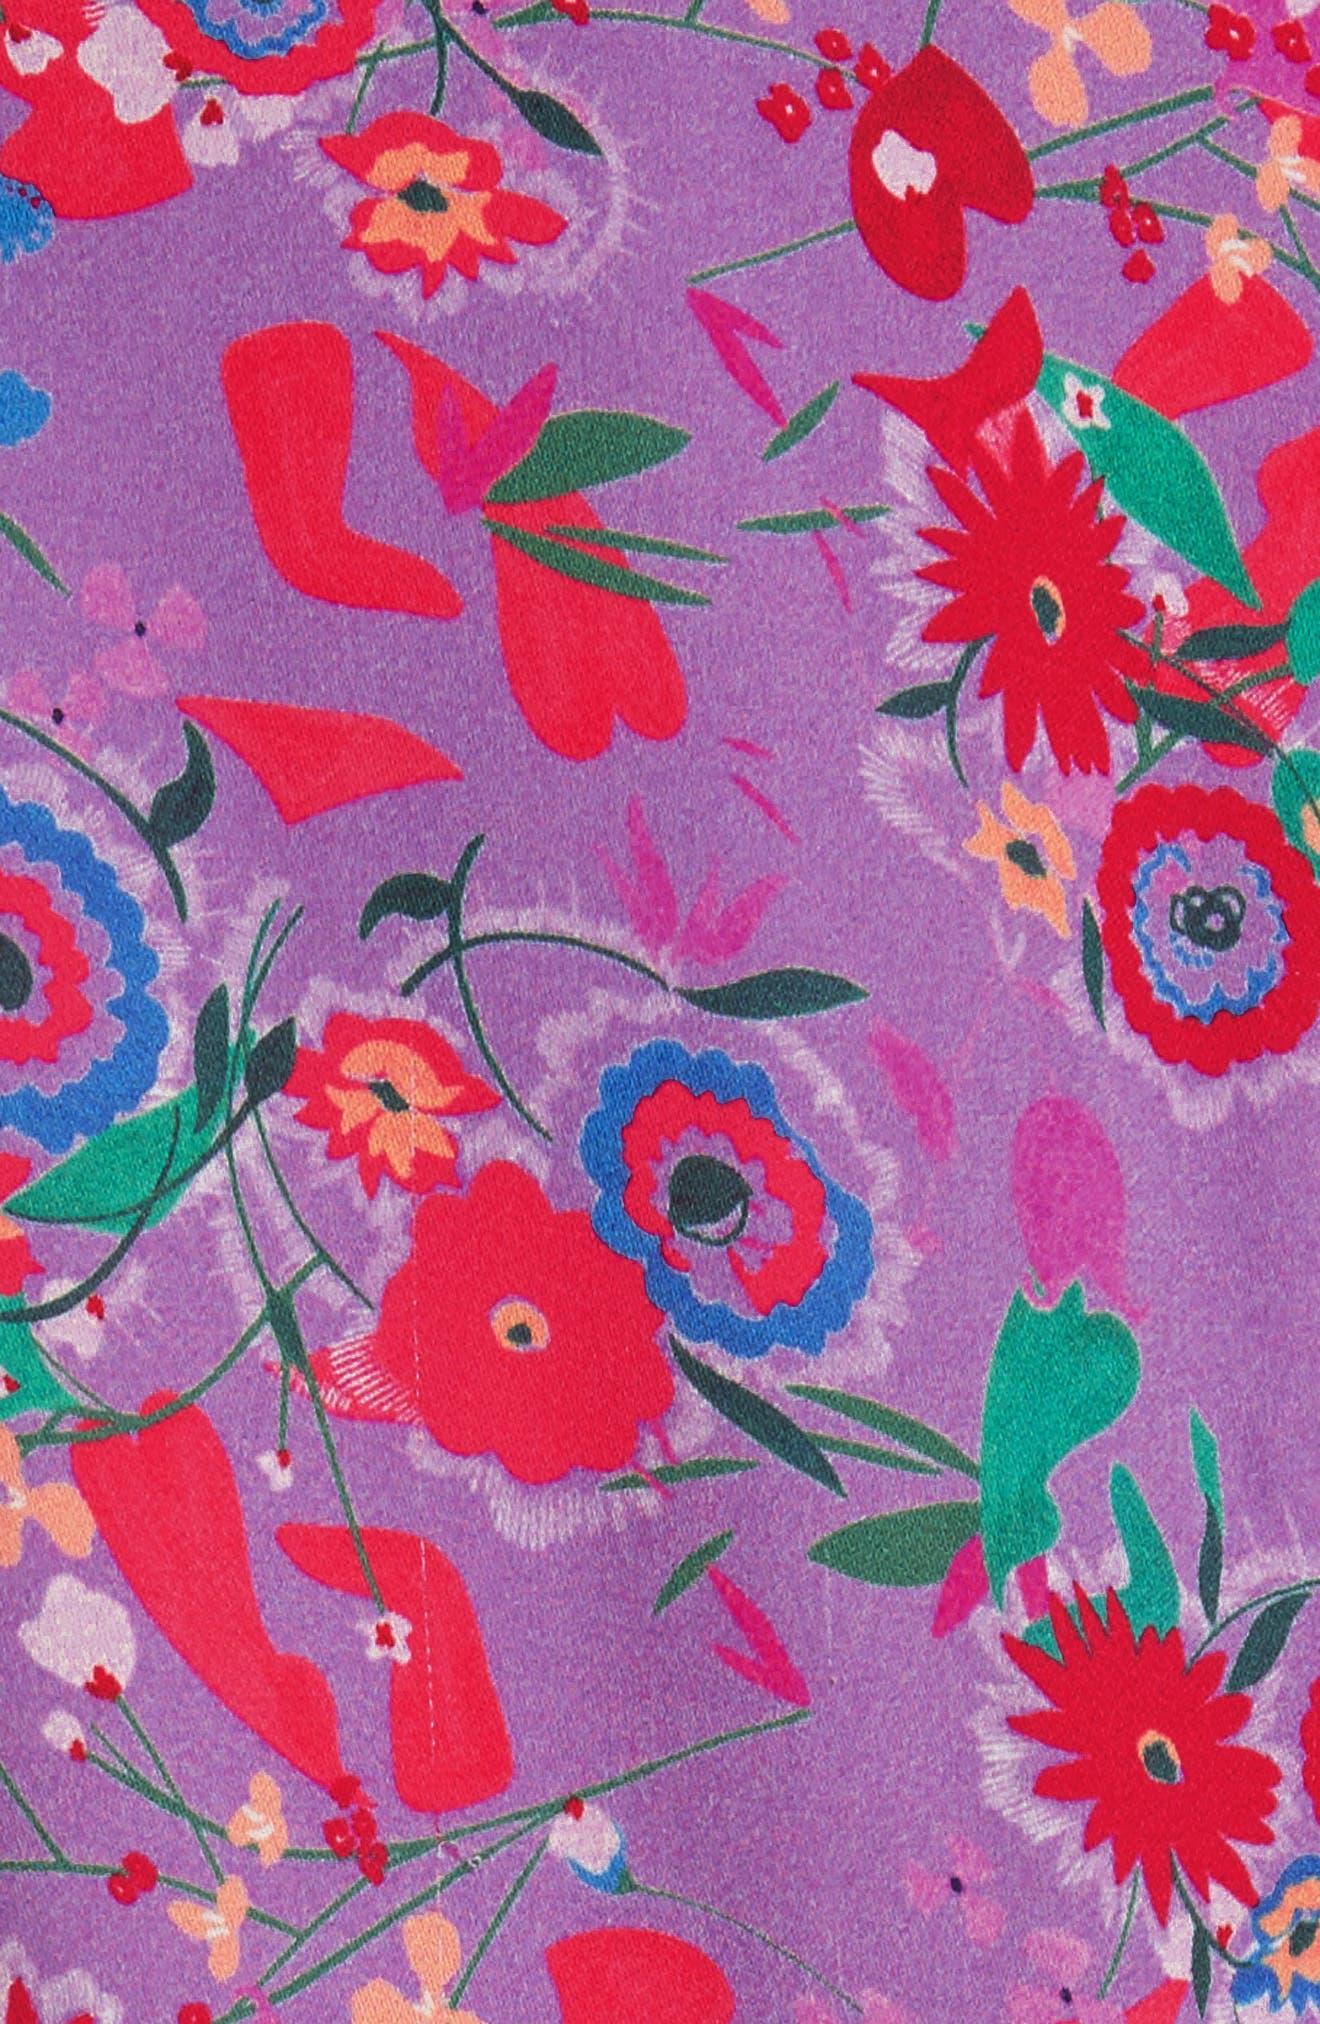 Eve Floral Print Dress,                             Alternate thumbnail 6, color,                             531